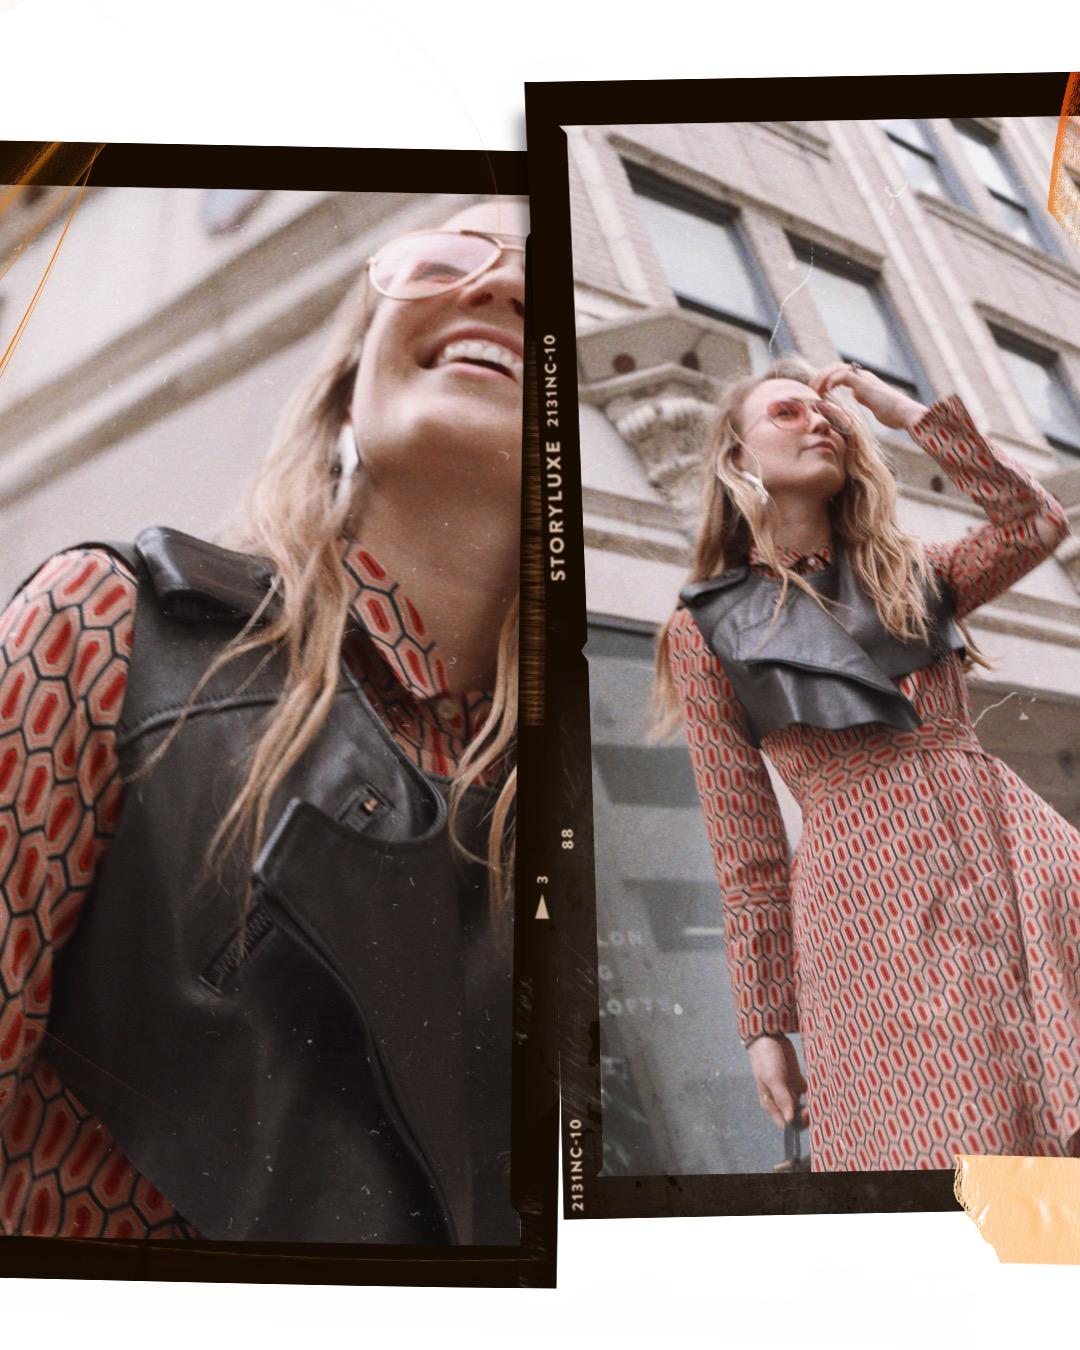 editorial-fashion-inspo.JPG